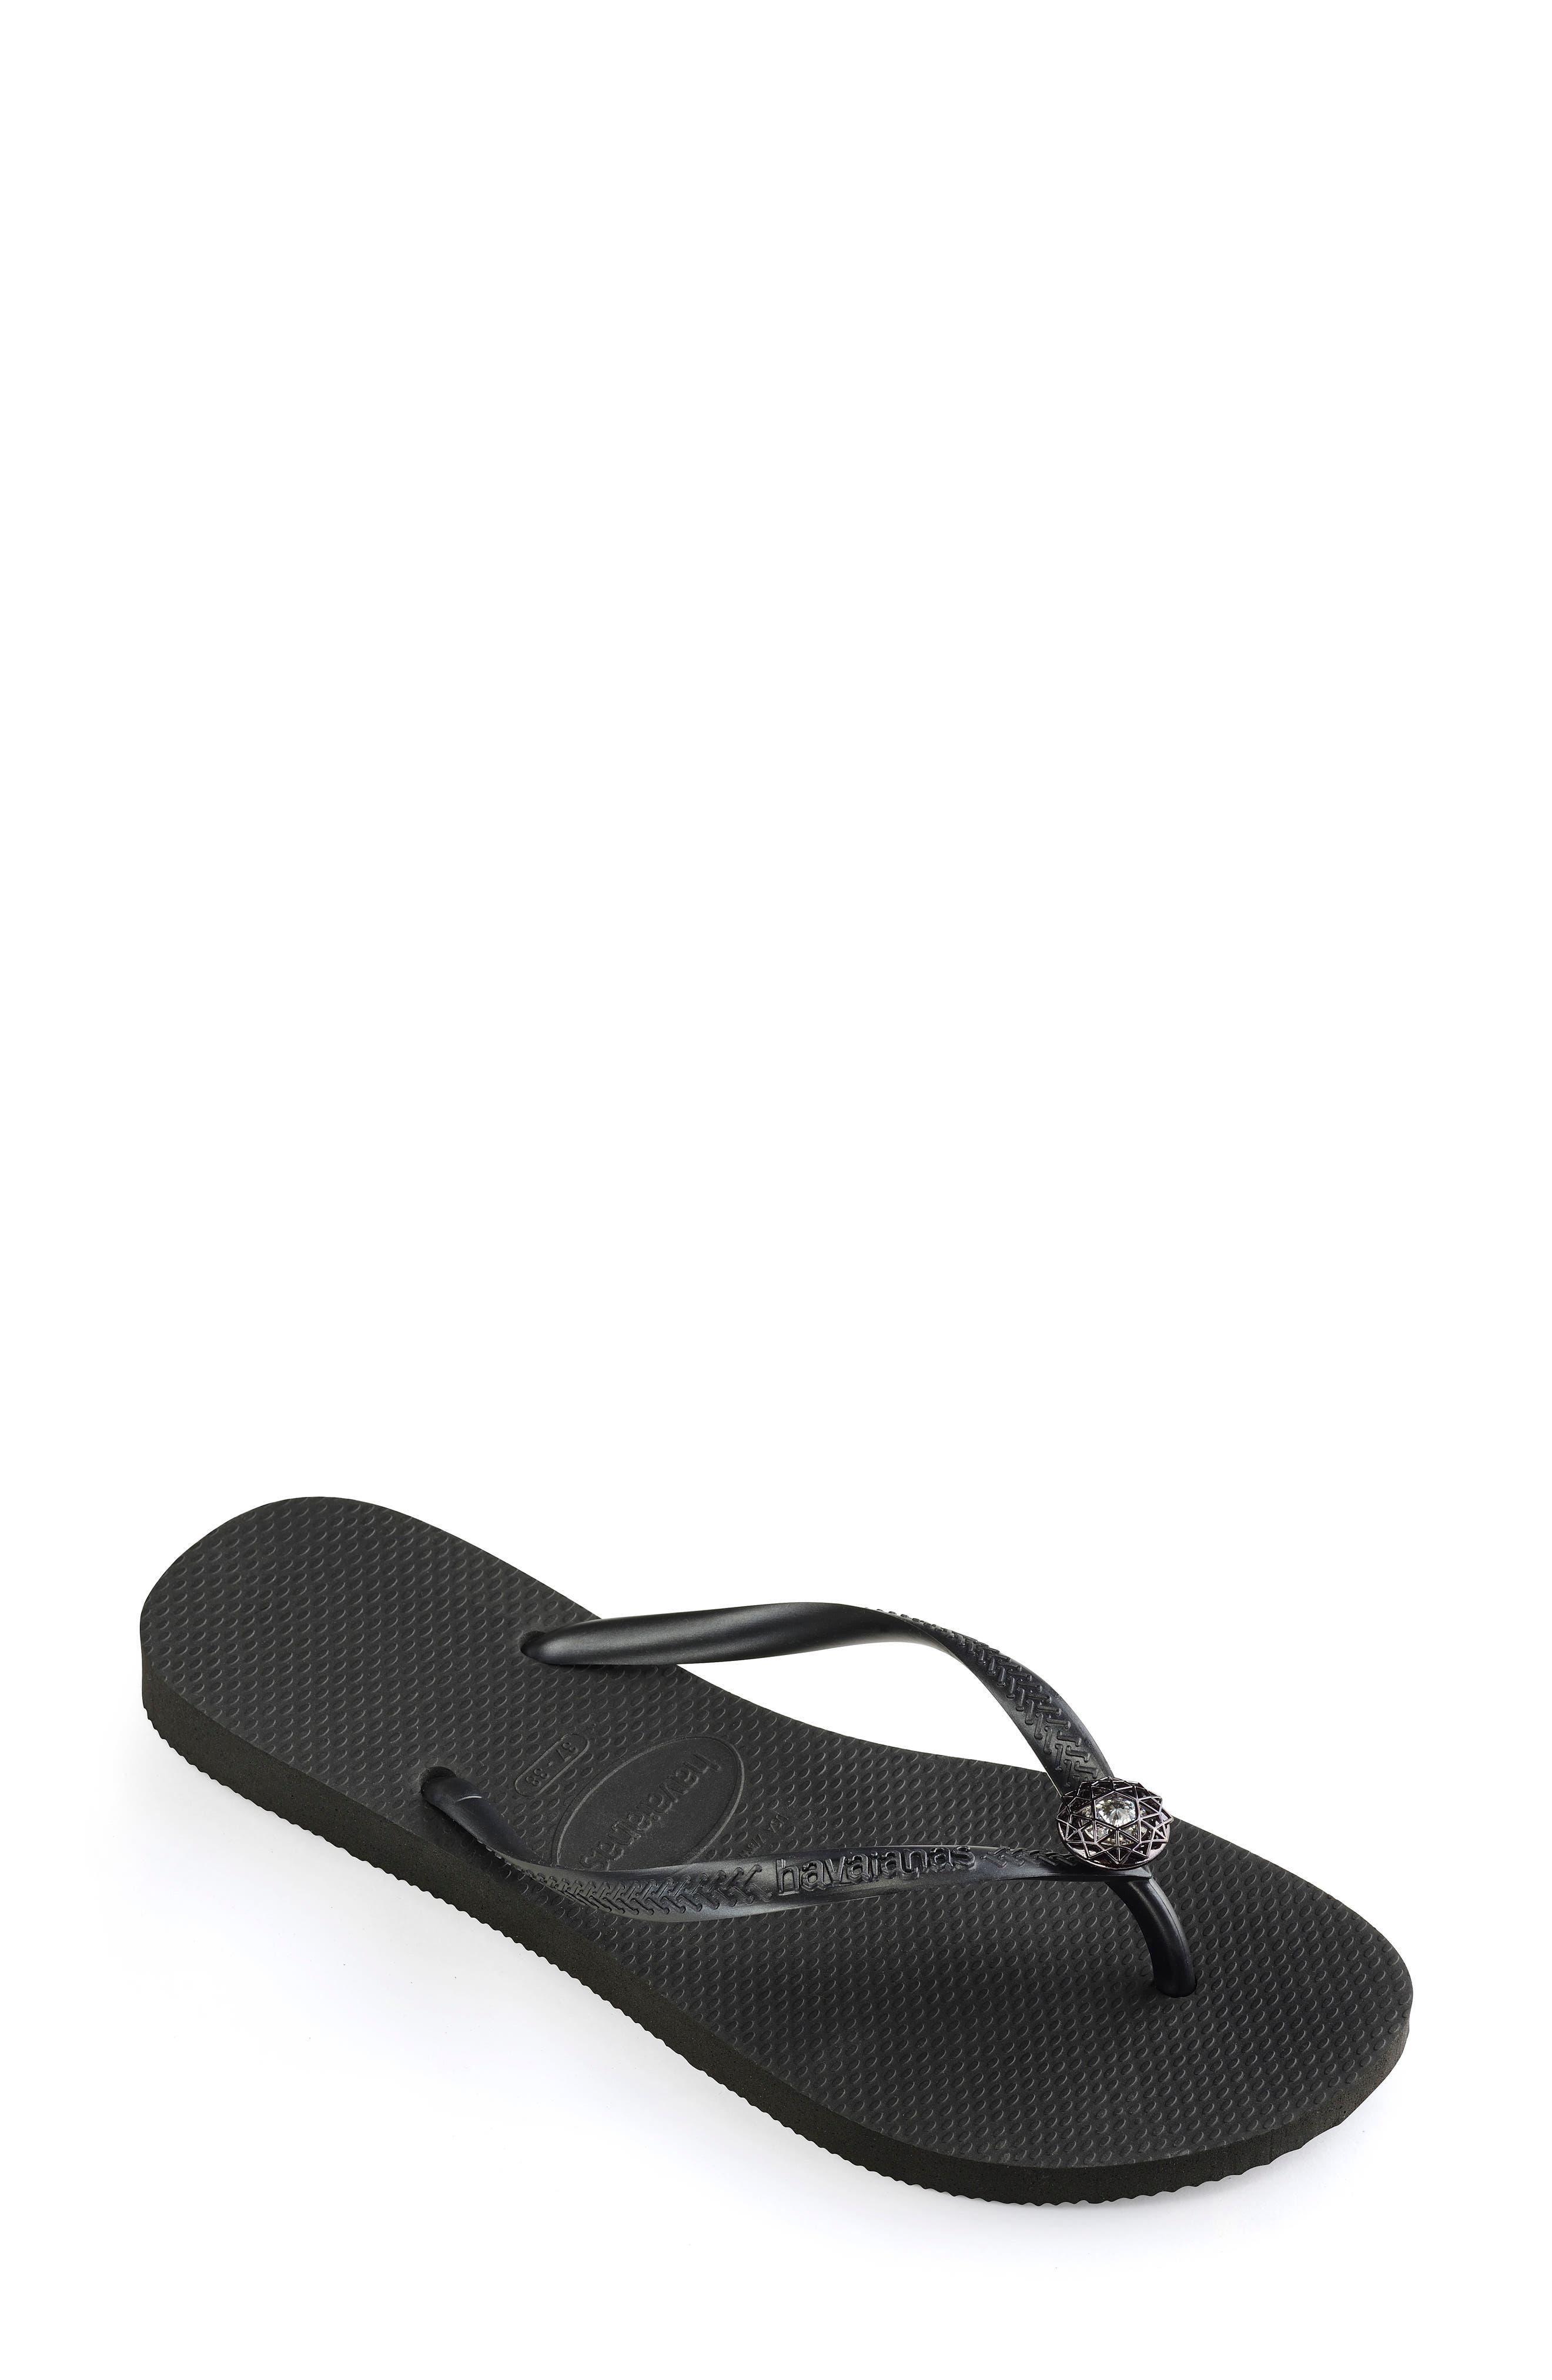 cb9609a08e27f1 Women s Havaianas Sandals